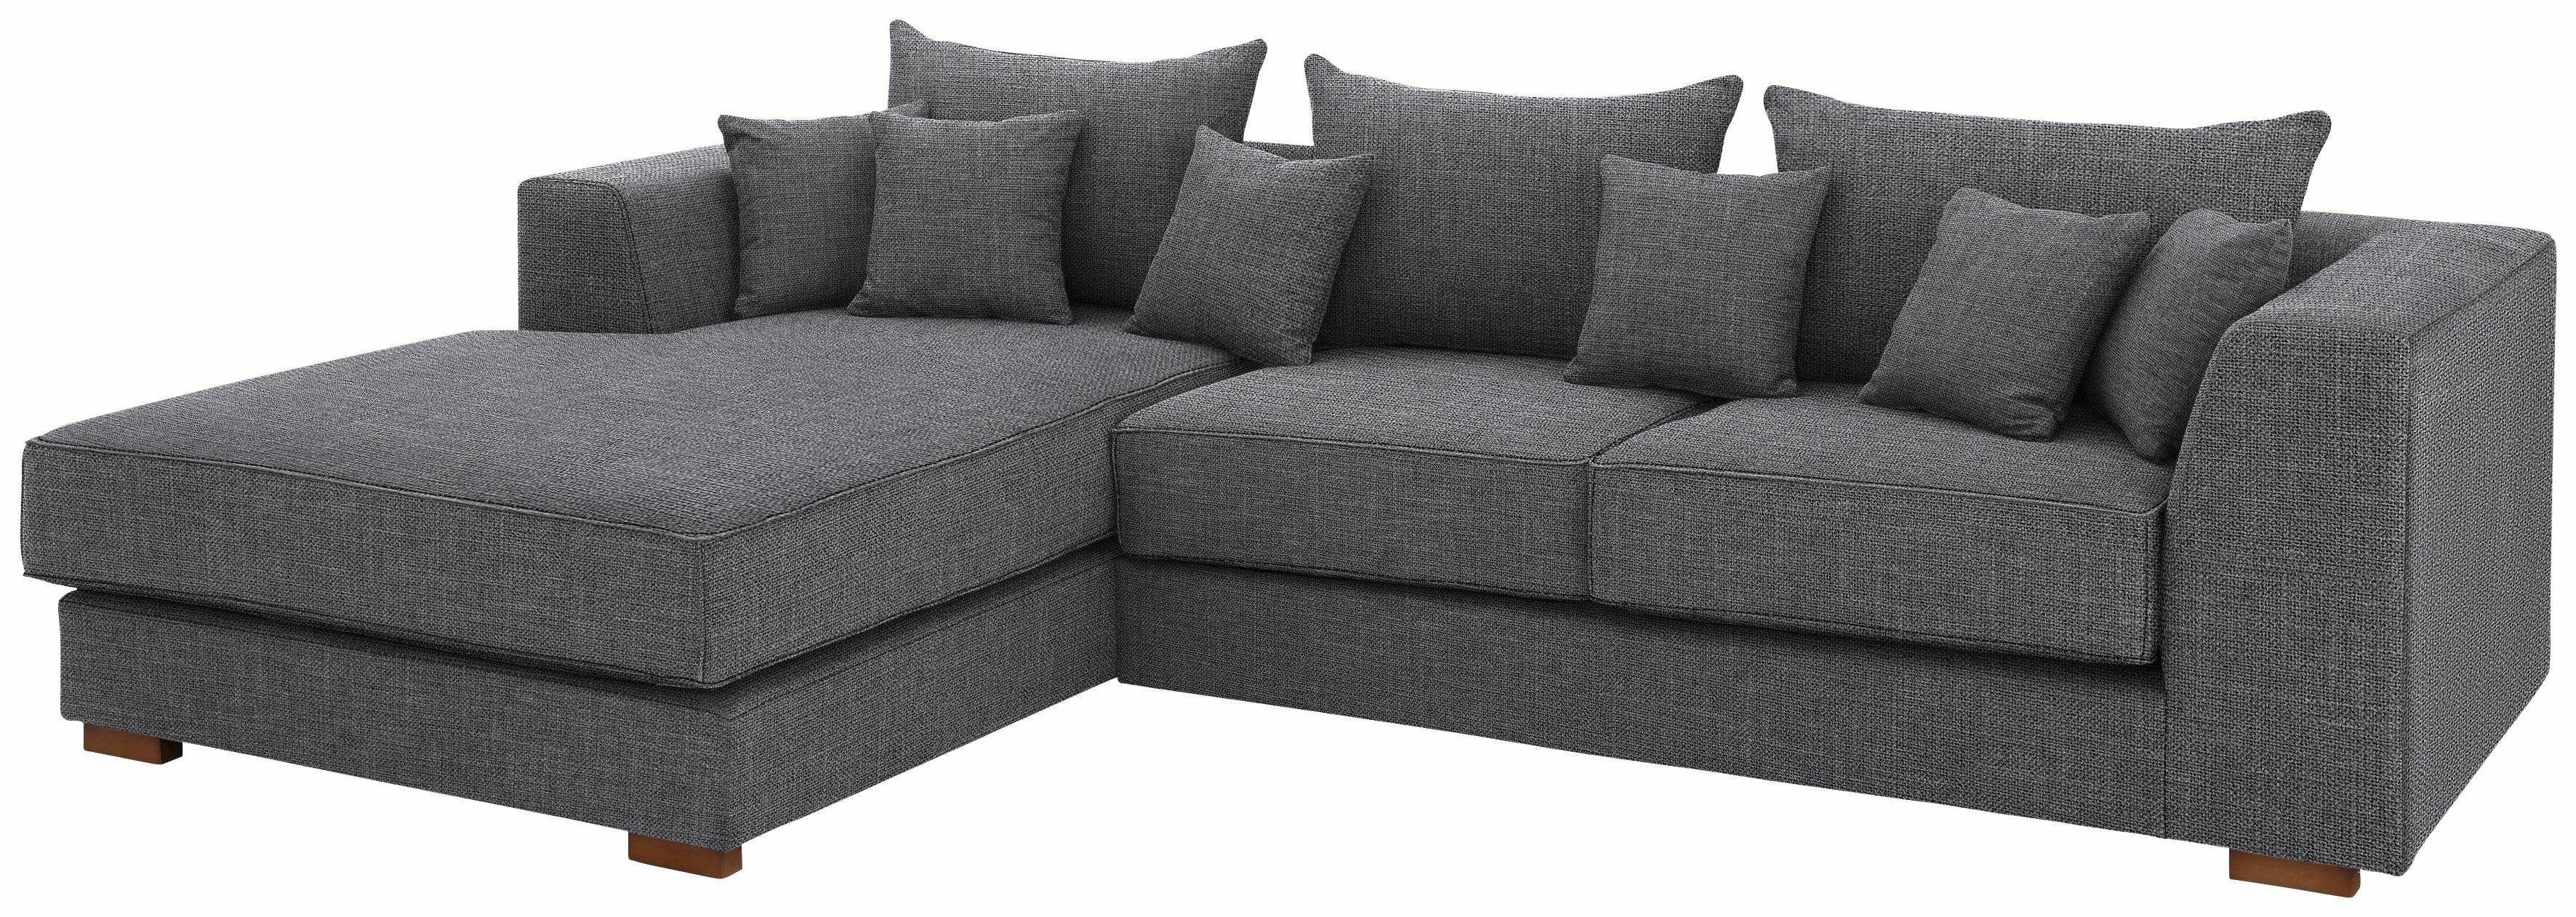 home affaire mbel hersteller great home affaire merino incl breiten hrtegrade with home affaire. Black Bedroom Furniture Sets. Home Design Ideas